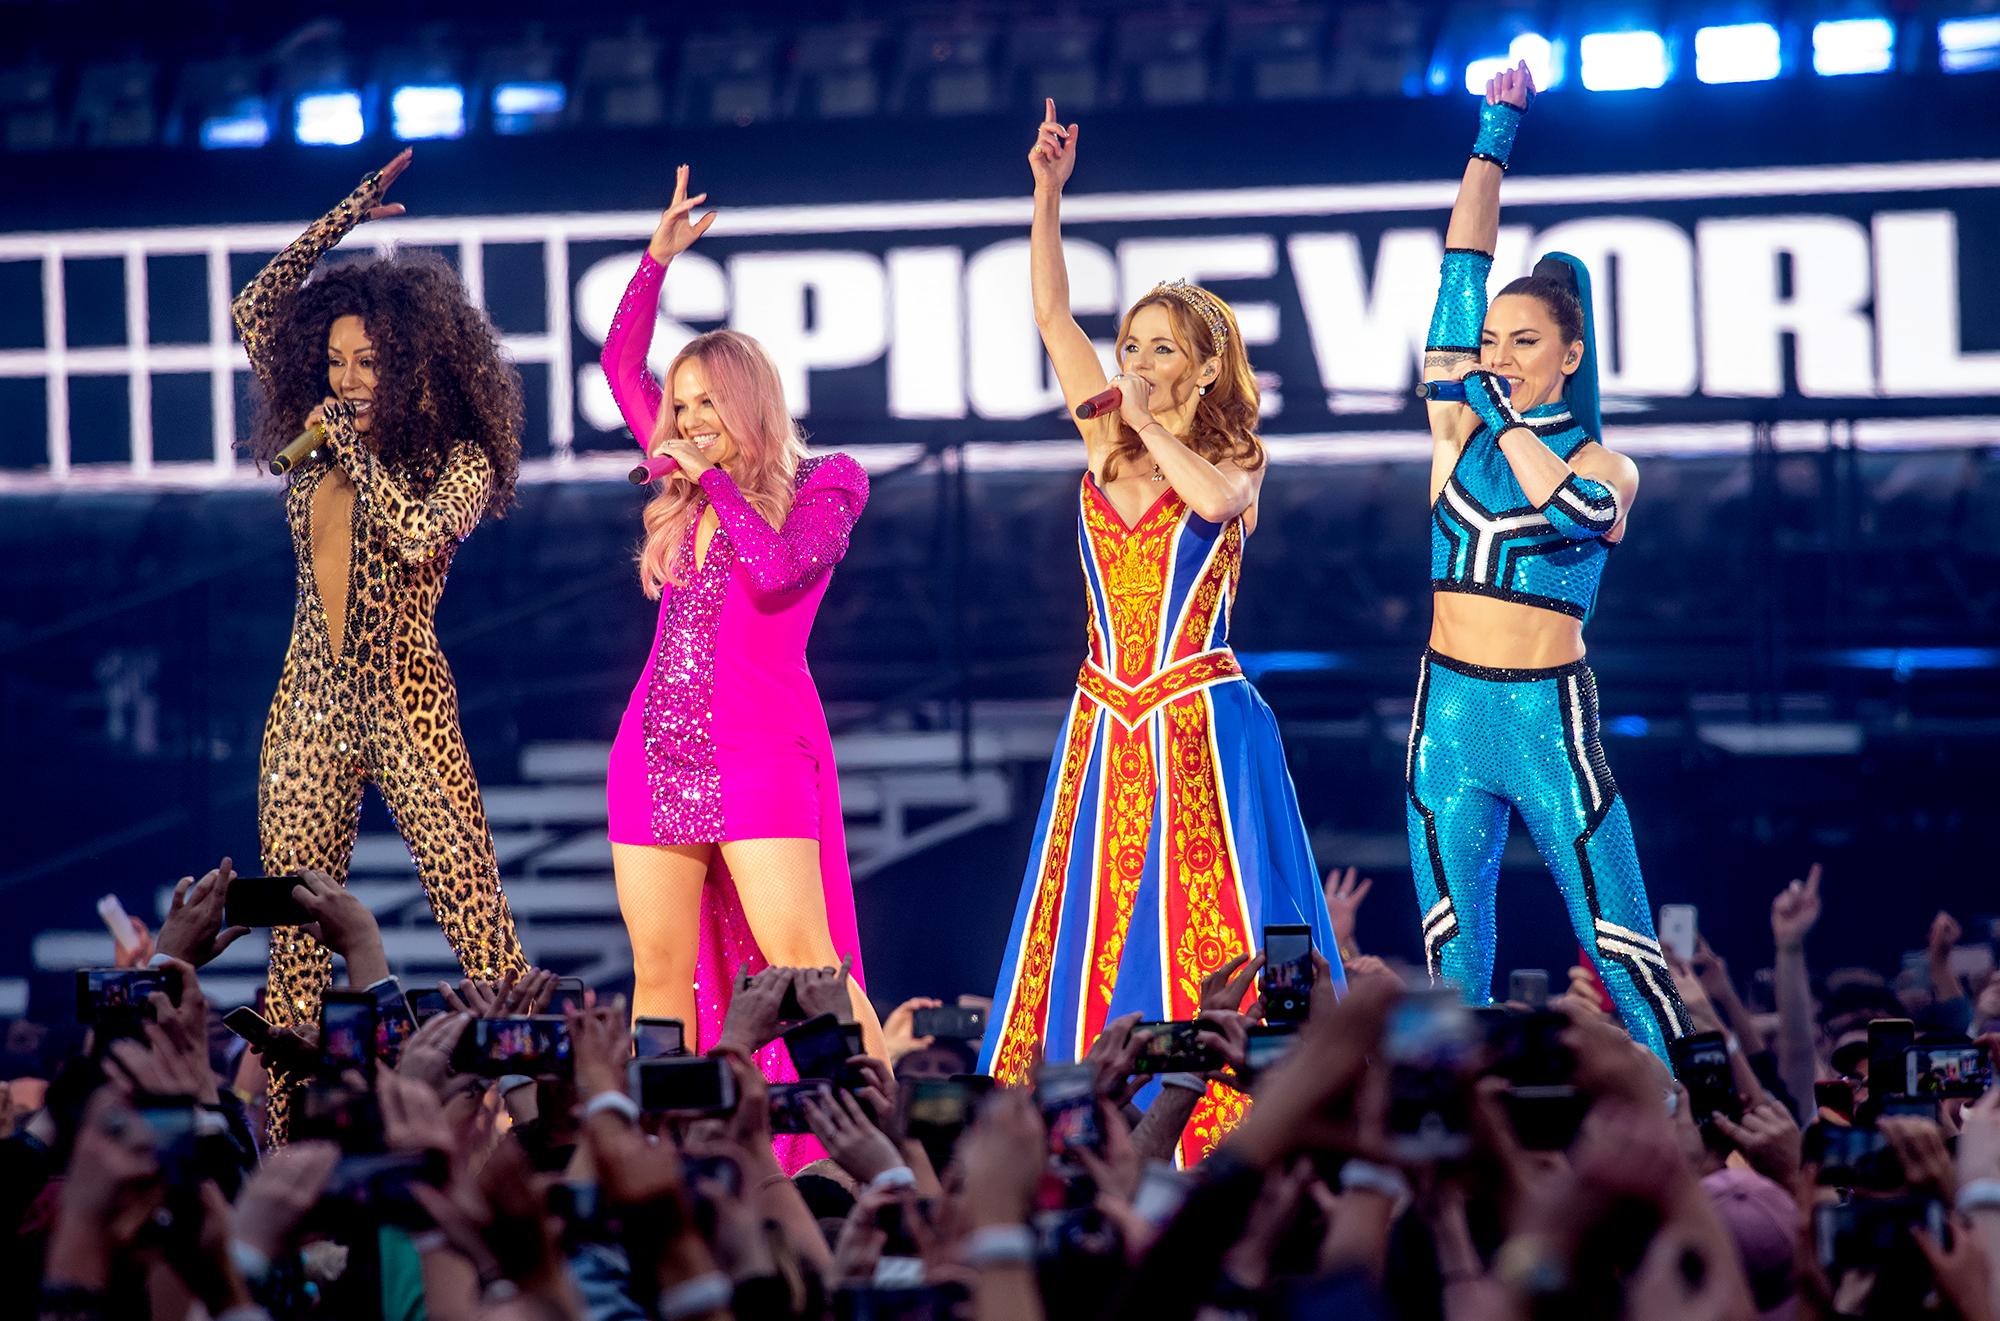 Mel-B,-Emma-Bunton,-Geri-Halliwell-and-Melanie-C-Spice-Girls-Reunion-Tour